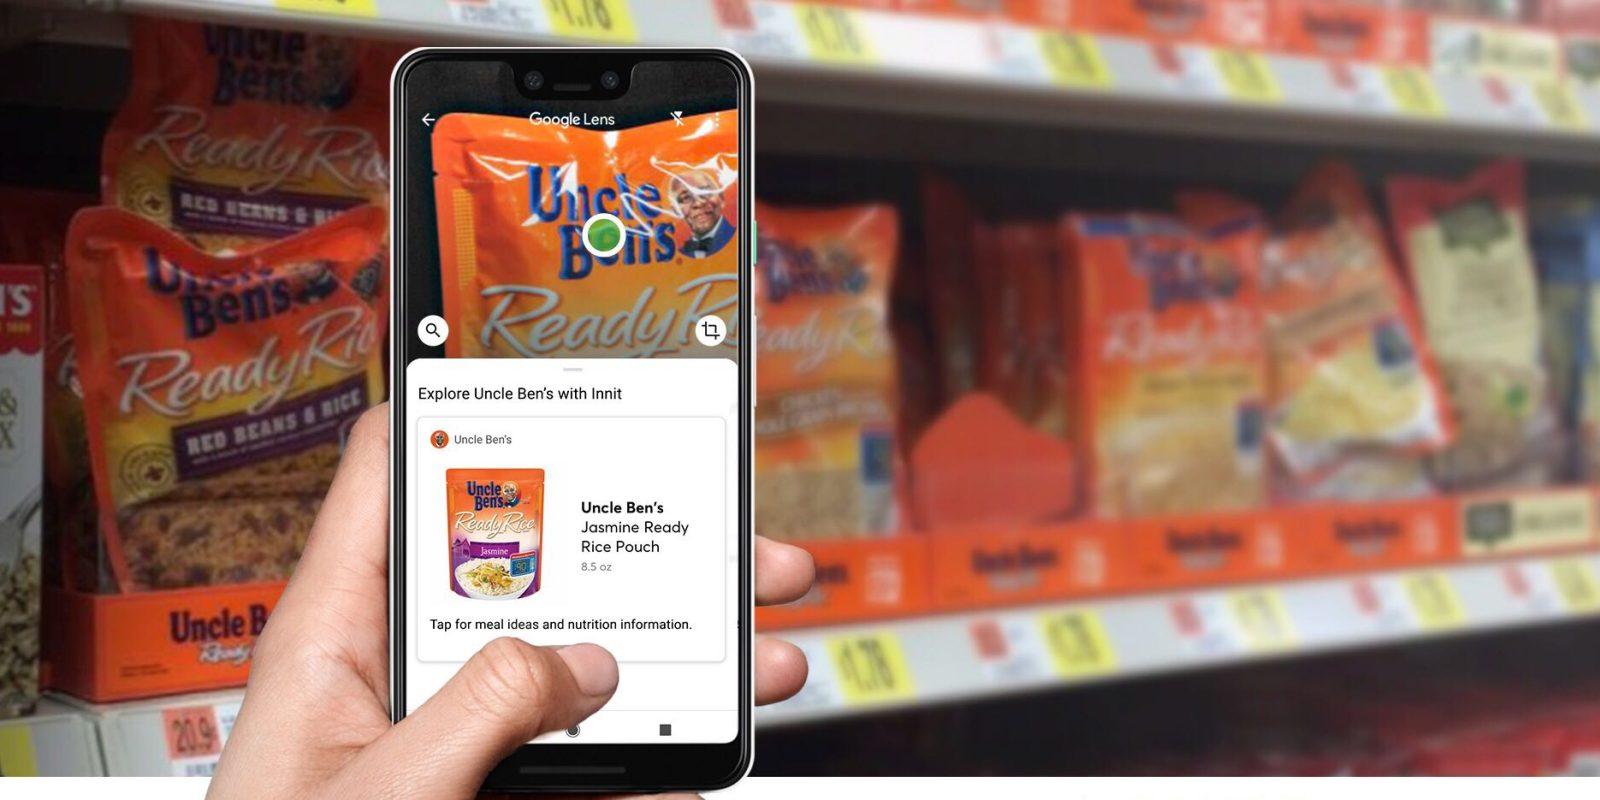 Google Lens gets first grocery and supermarket AR integration